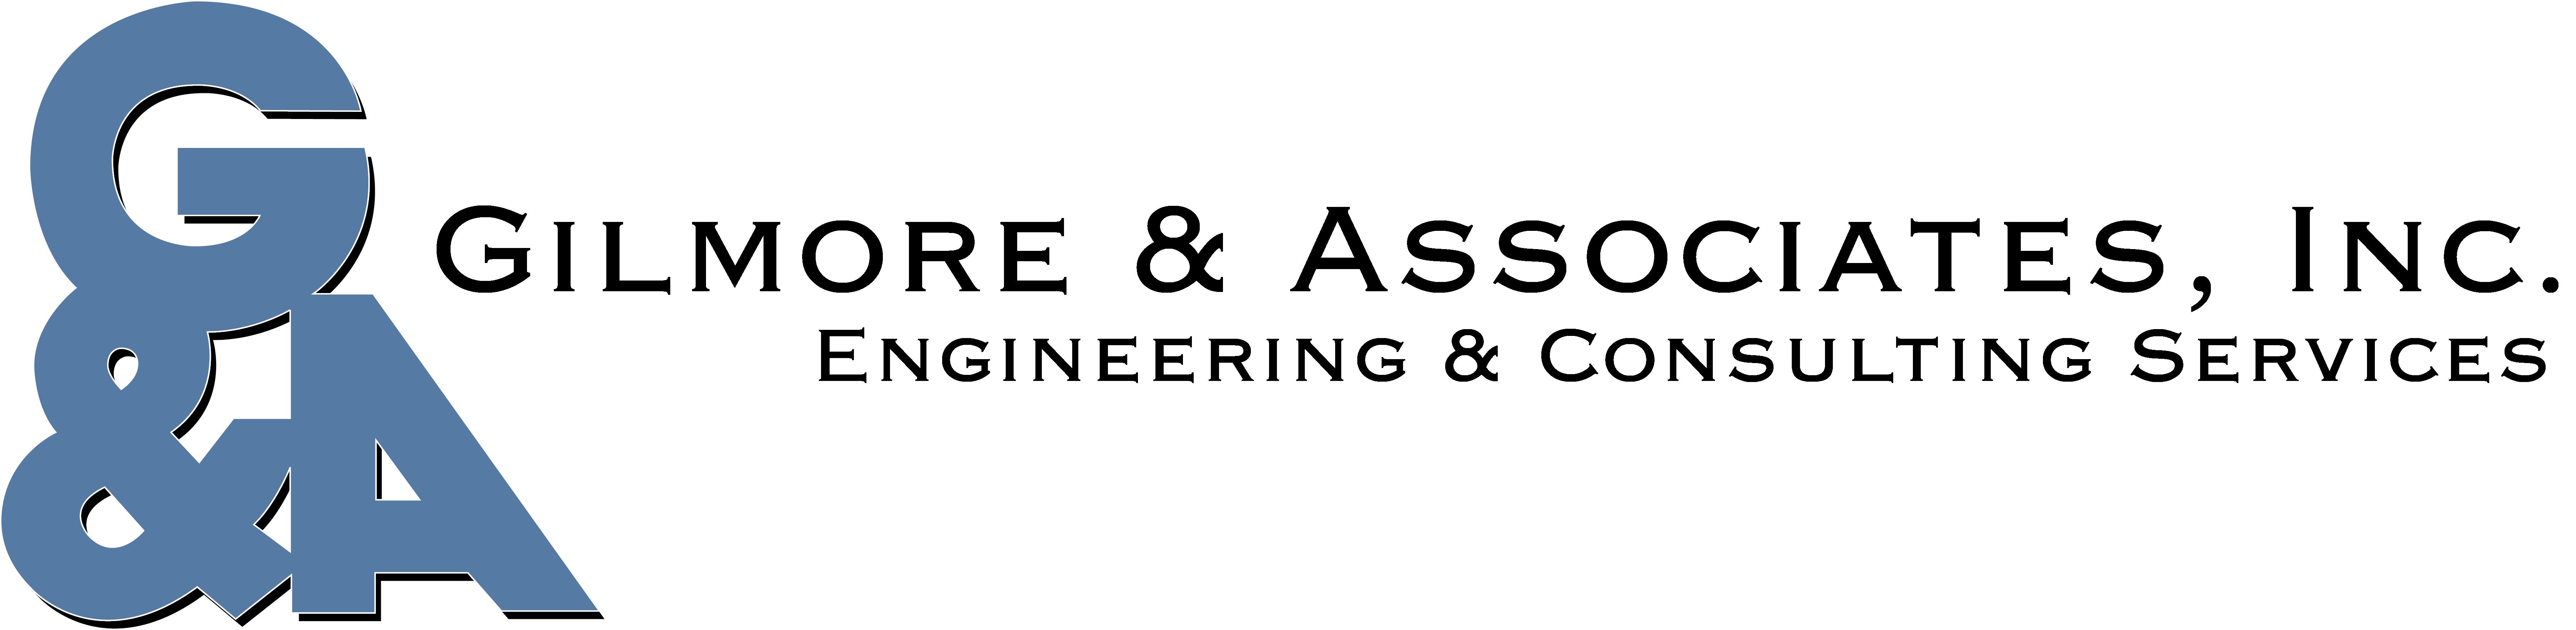 G&A Full Logo 7462U